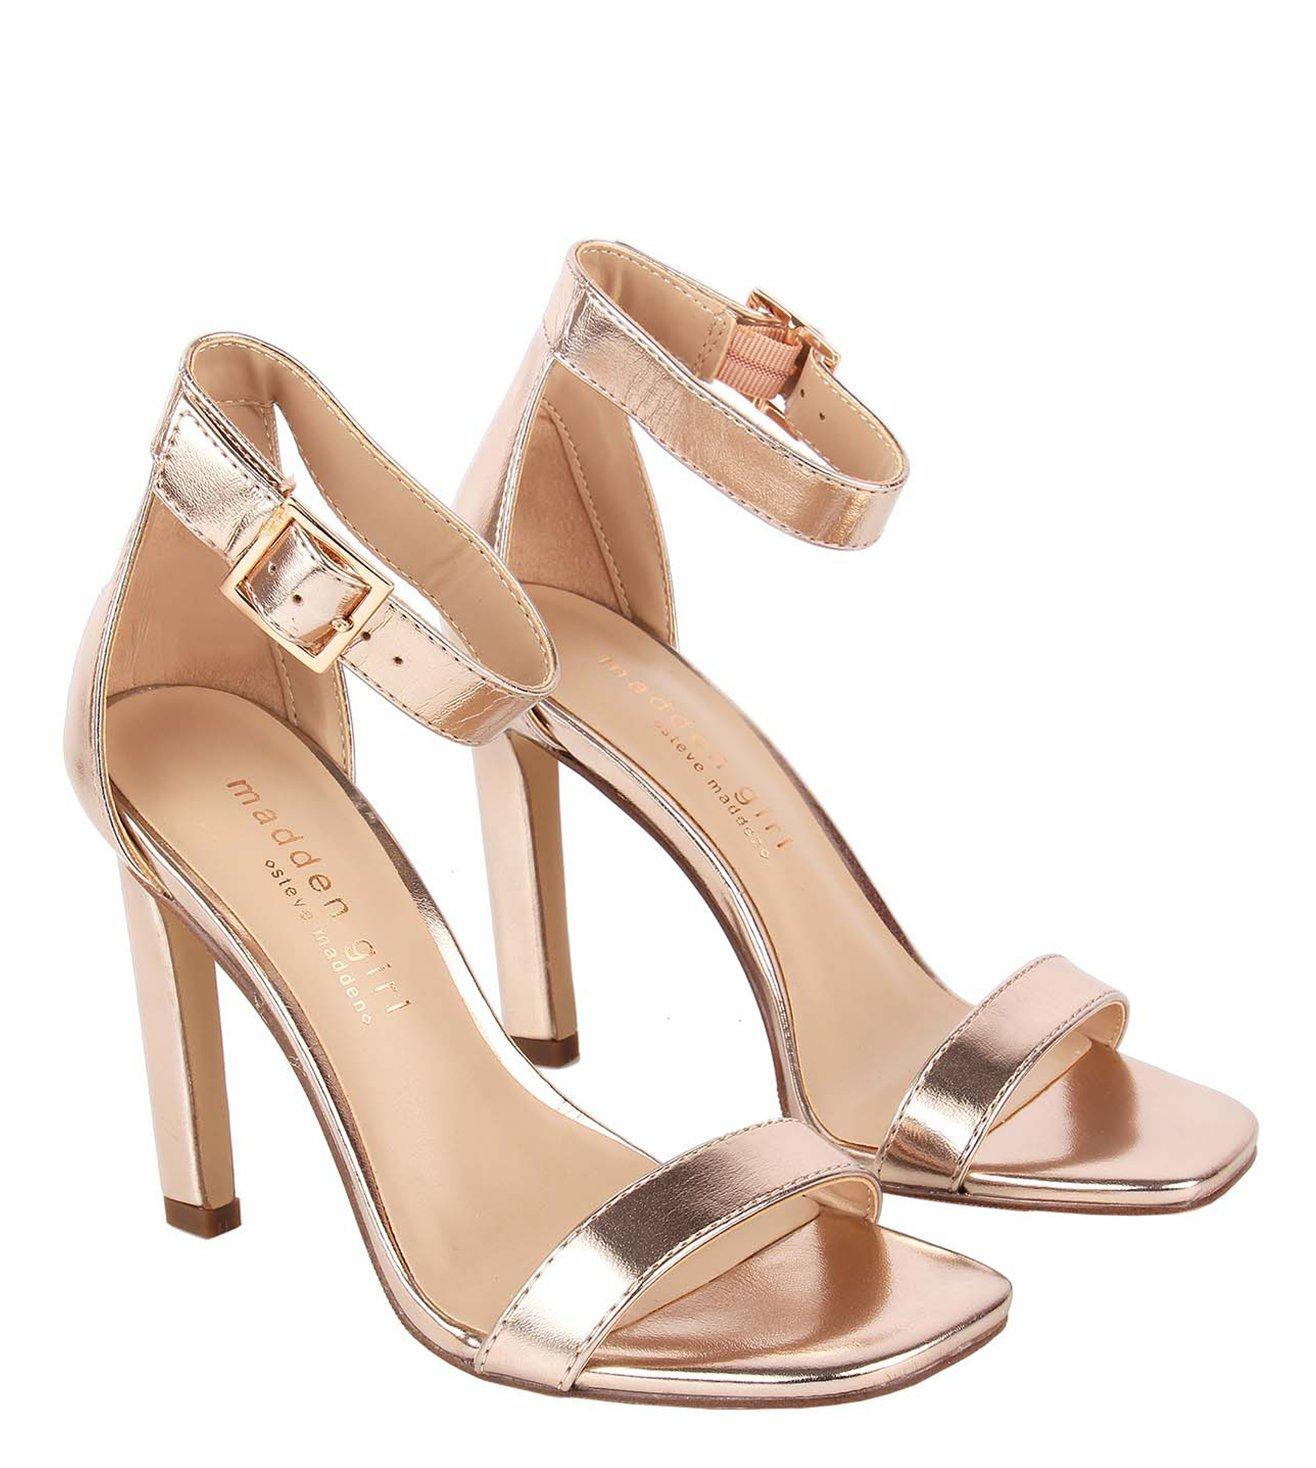 Steve Madden Rose Gold Ara Heel Sandals